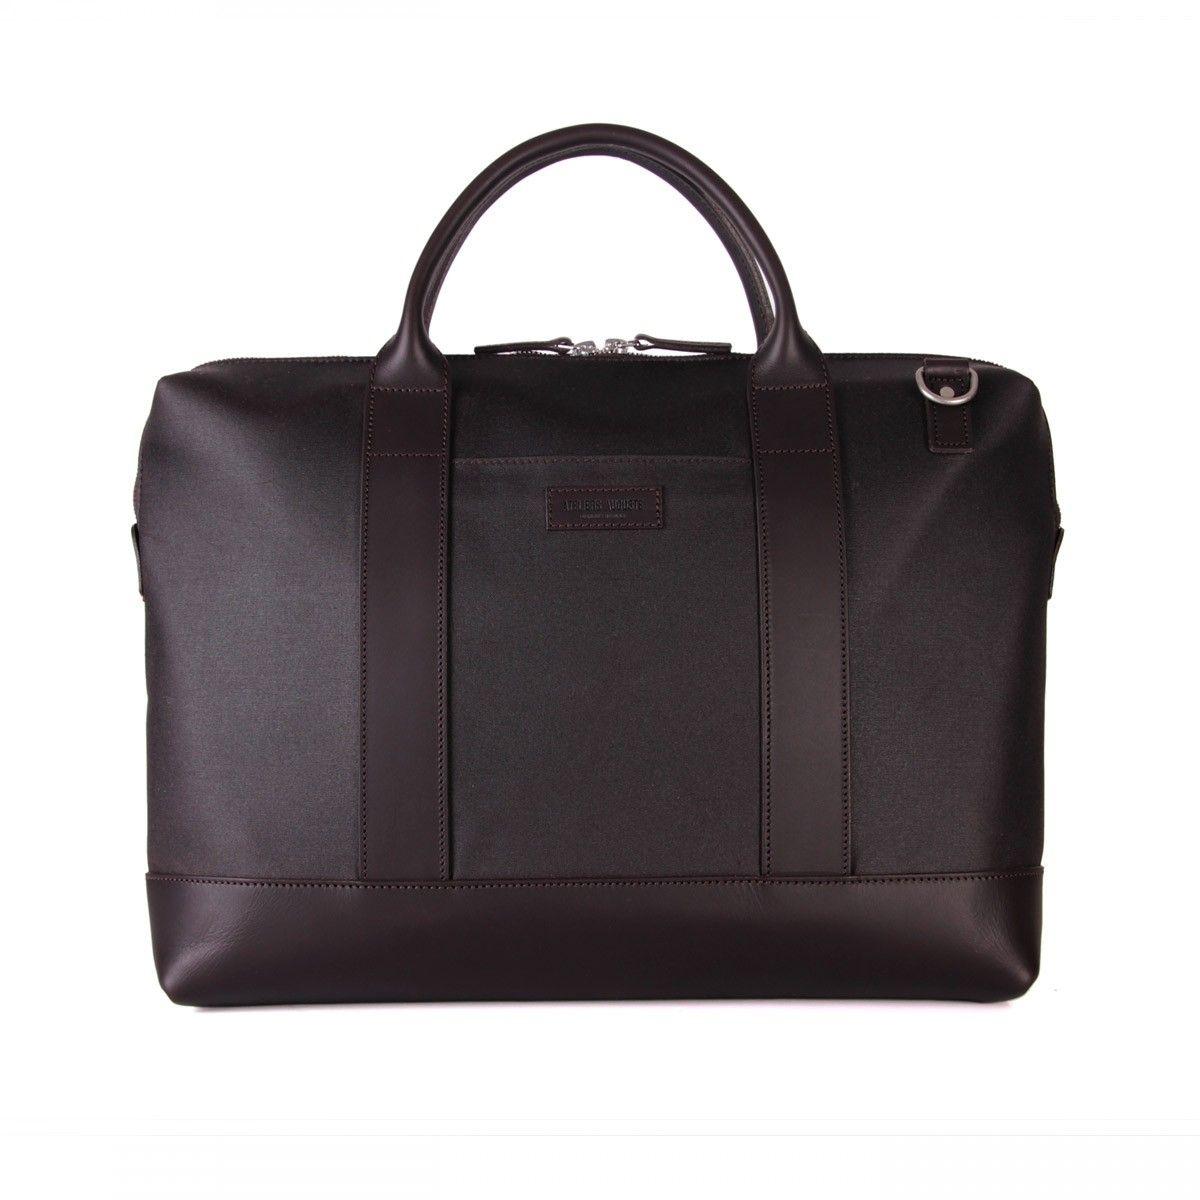 17 best ideas about sac cuir homme on pinterest sacs pour homme pochette homme cuir and sac. Black Bedroom Furniture Sets. Home Design Ideas